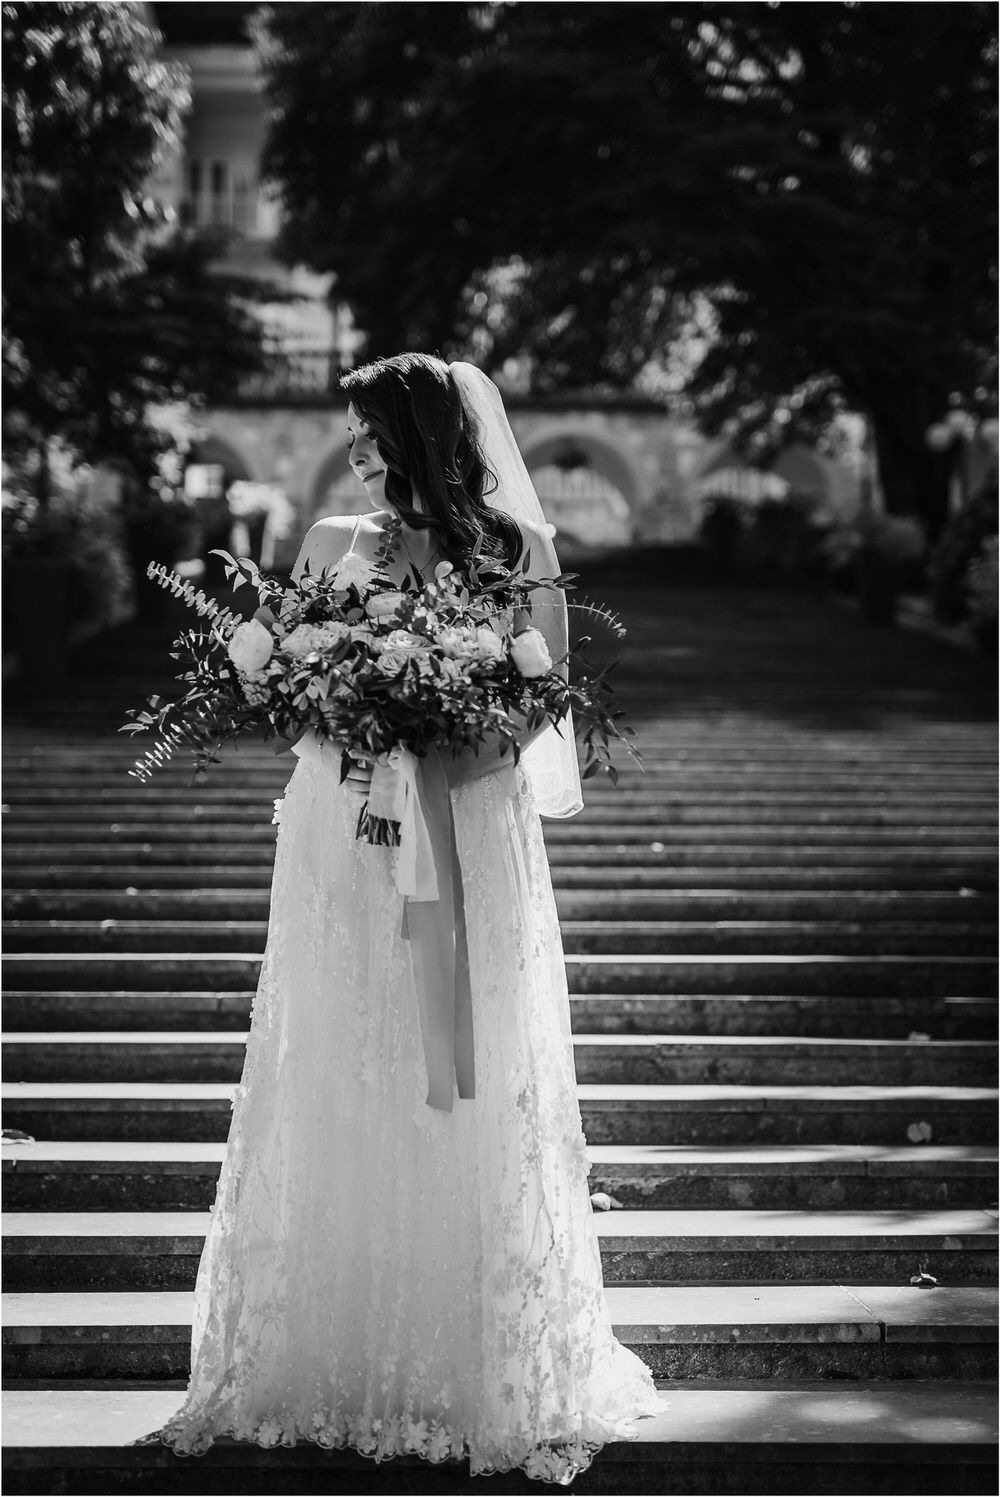 lake bled slovenia wedding vila bled sanjski sopek bled castle ceremony outdoor romantic wedding photographer photography natural candid bright 0070.jpg